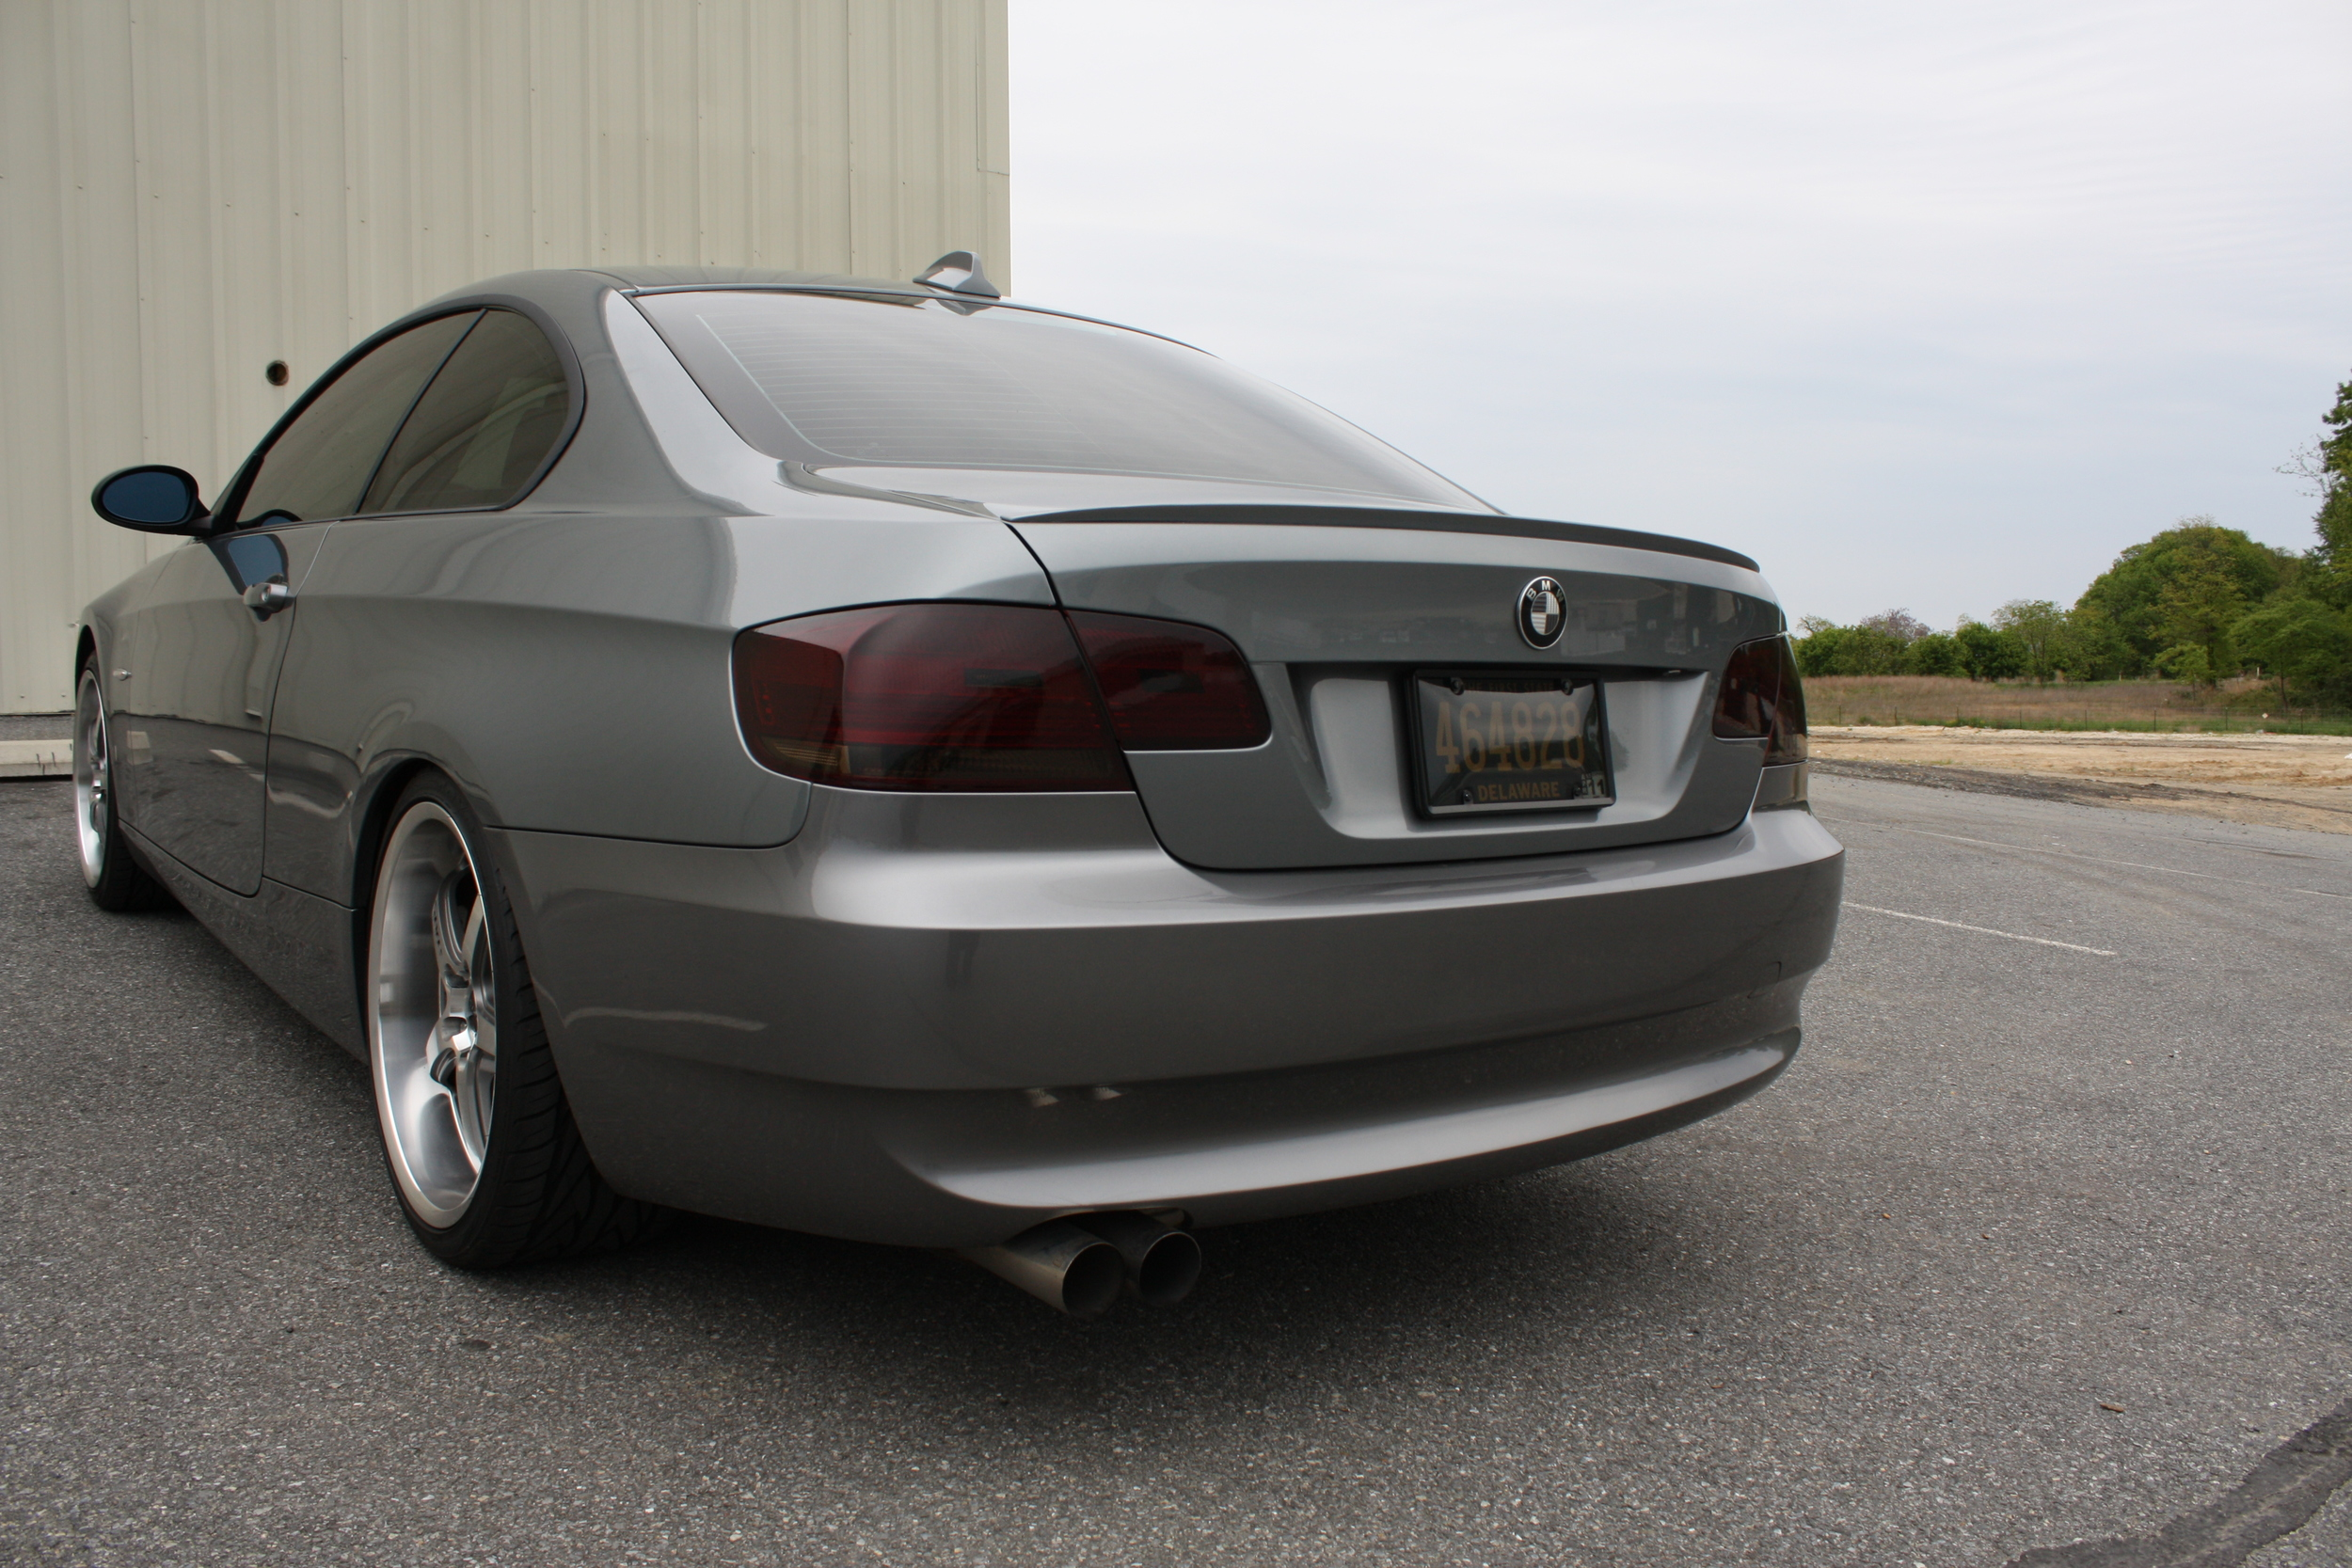 BMW Smoke Tail Lights.JPG